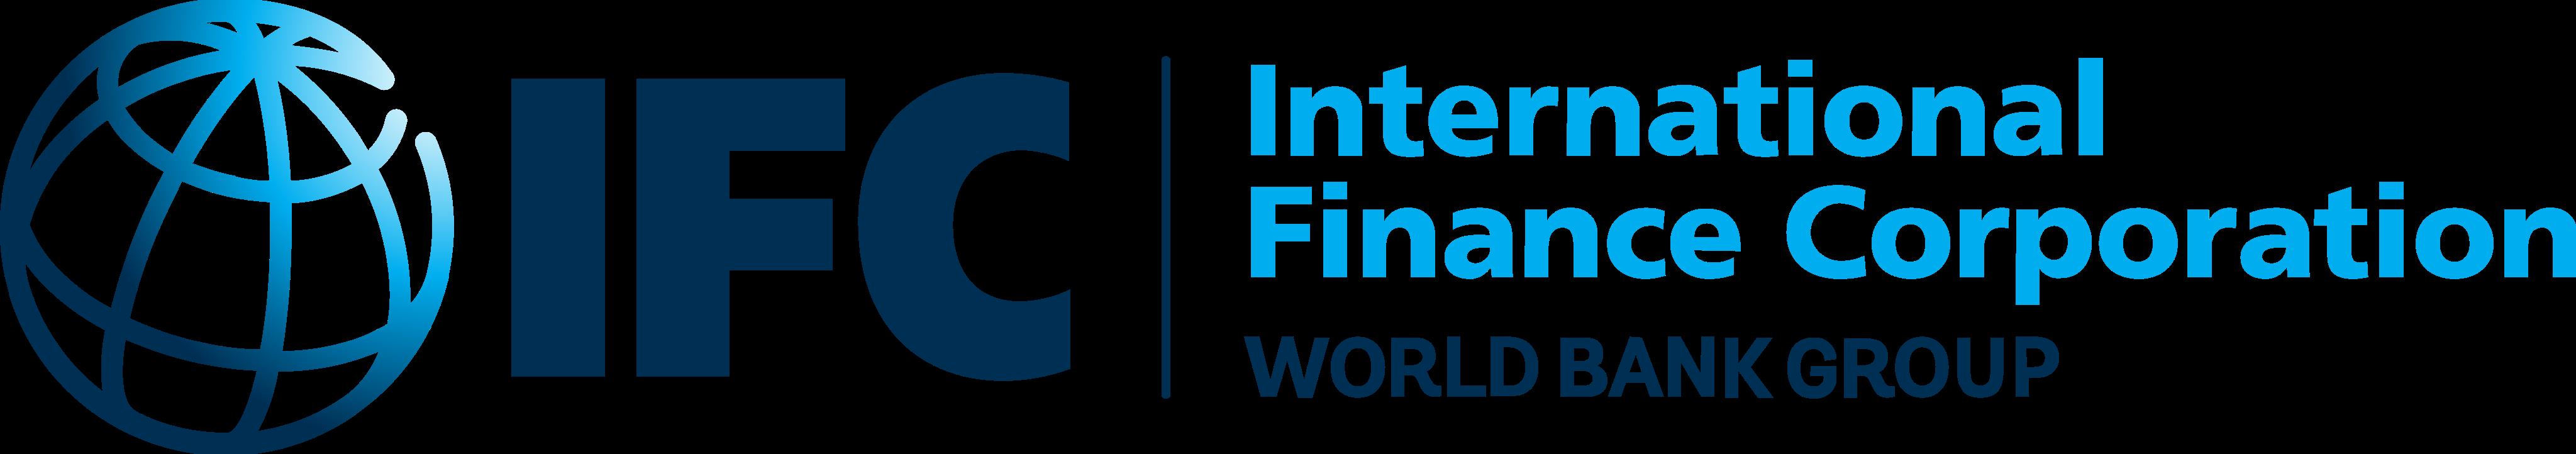 IFC Logo.